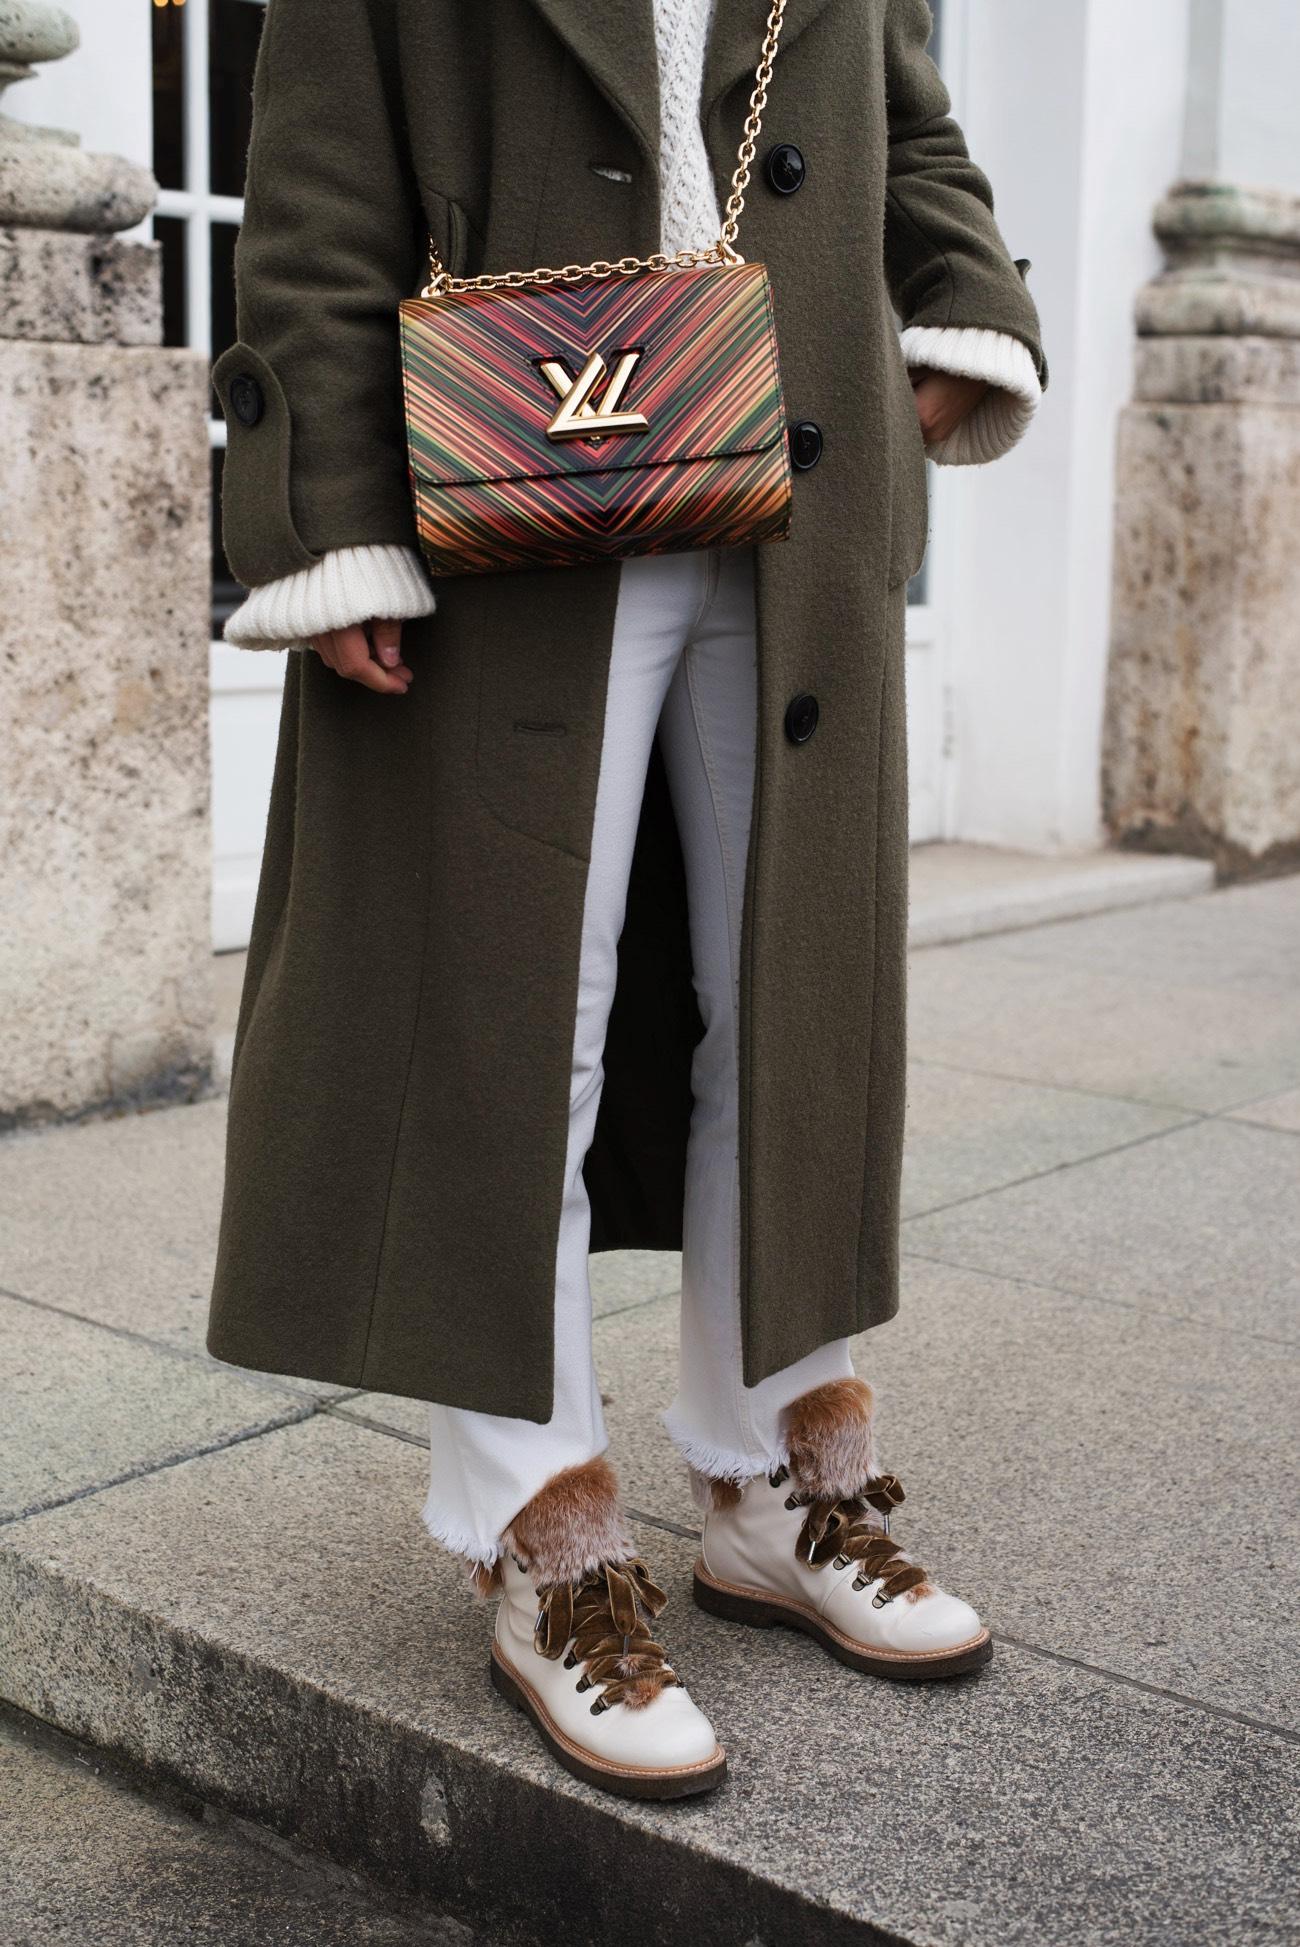 agl-lack-lederstiefel-mit-fell-wander-stiefeletten-trend-2016-fashiioncarpet